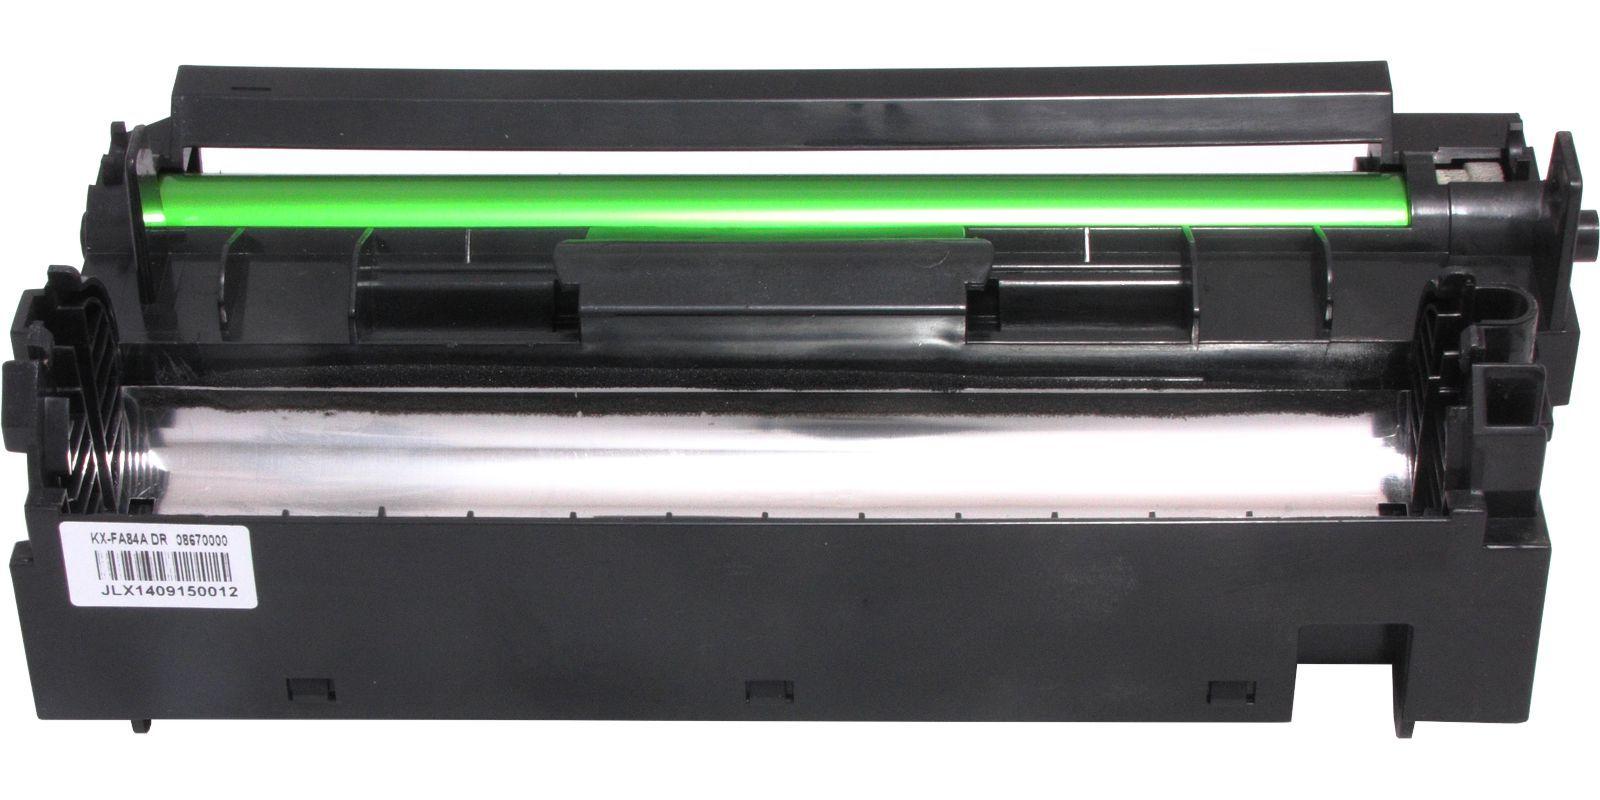 MAK KX-FA84A, черный, для Panasonic, DRUM Unit, до 10000 стр.